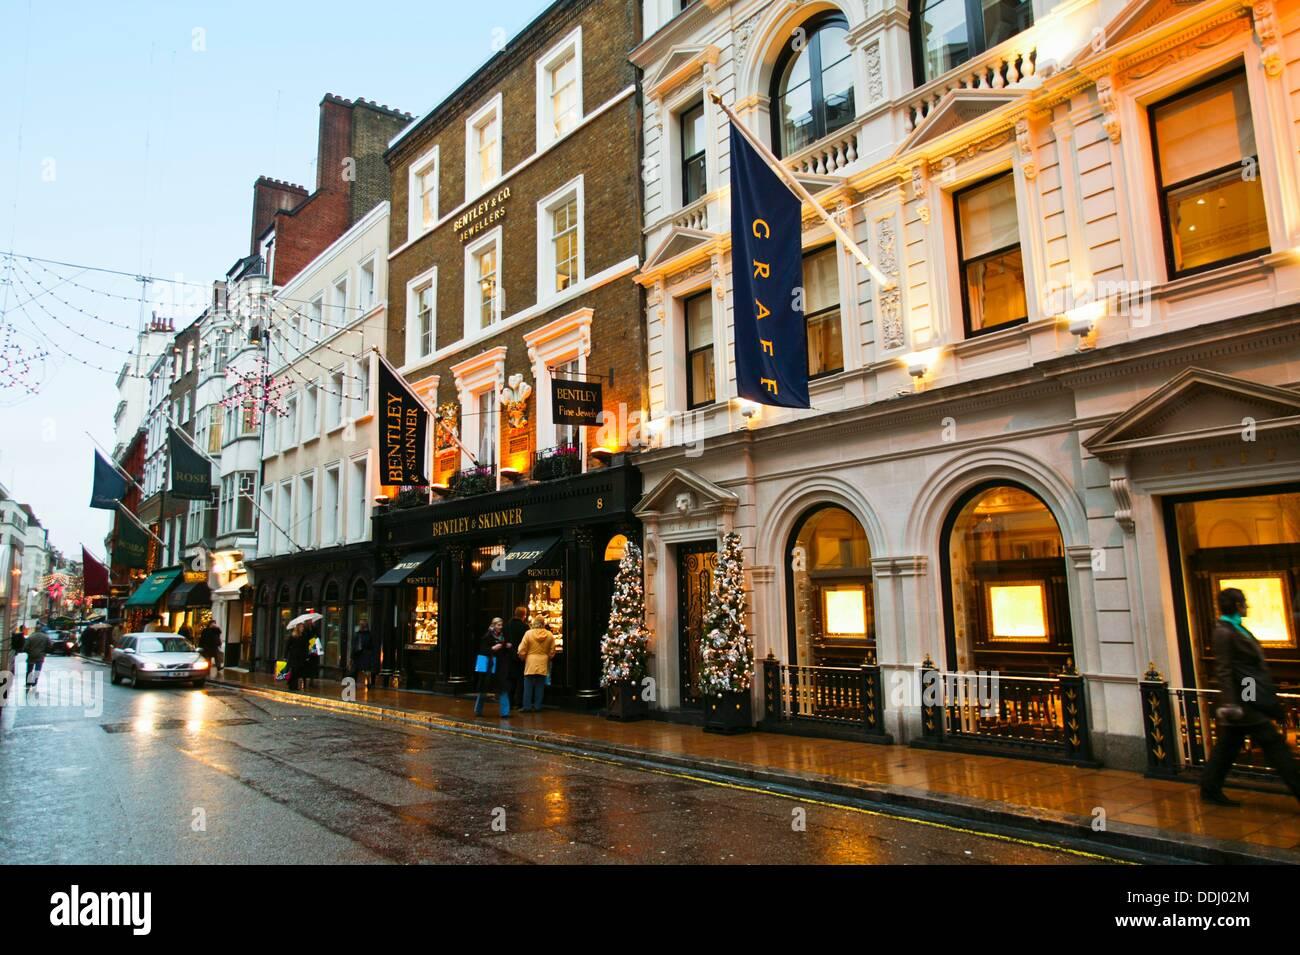 Bentley and Skinner jewelry. 144-146 New Bond Street Picadilly London England United Kingdom UK Europe. - Stock Image